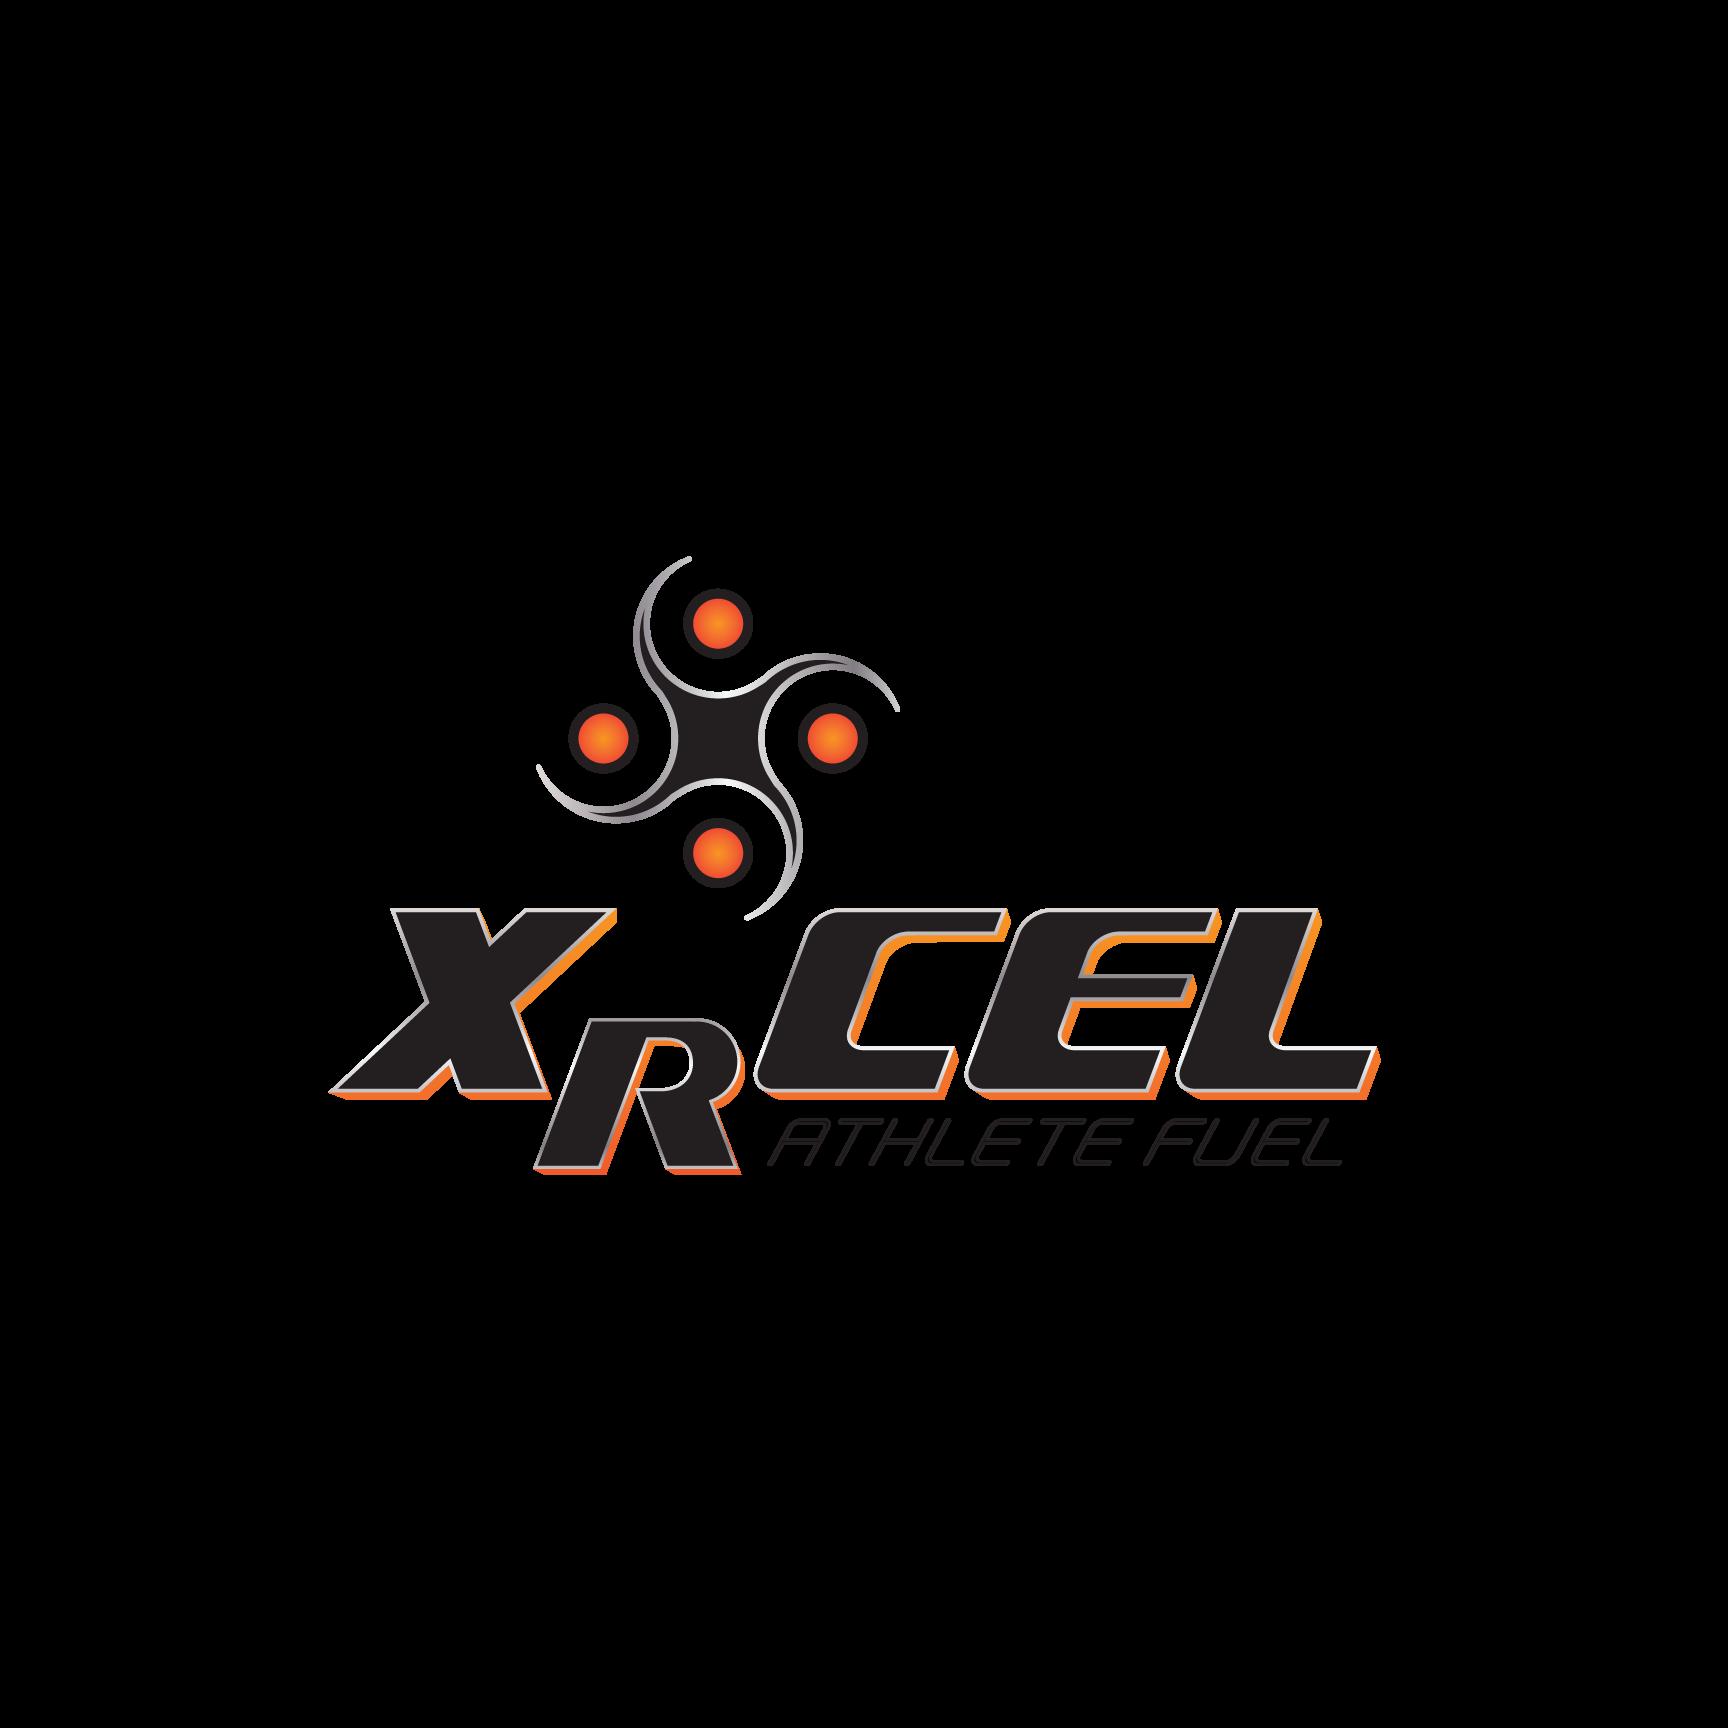 Sponsor XRCEL